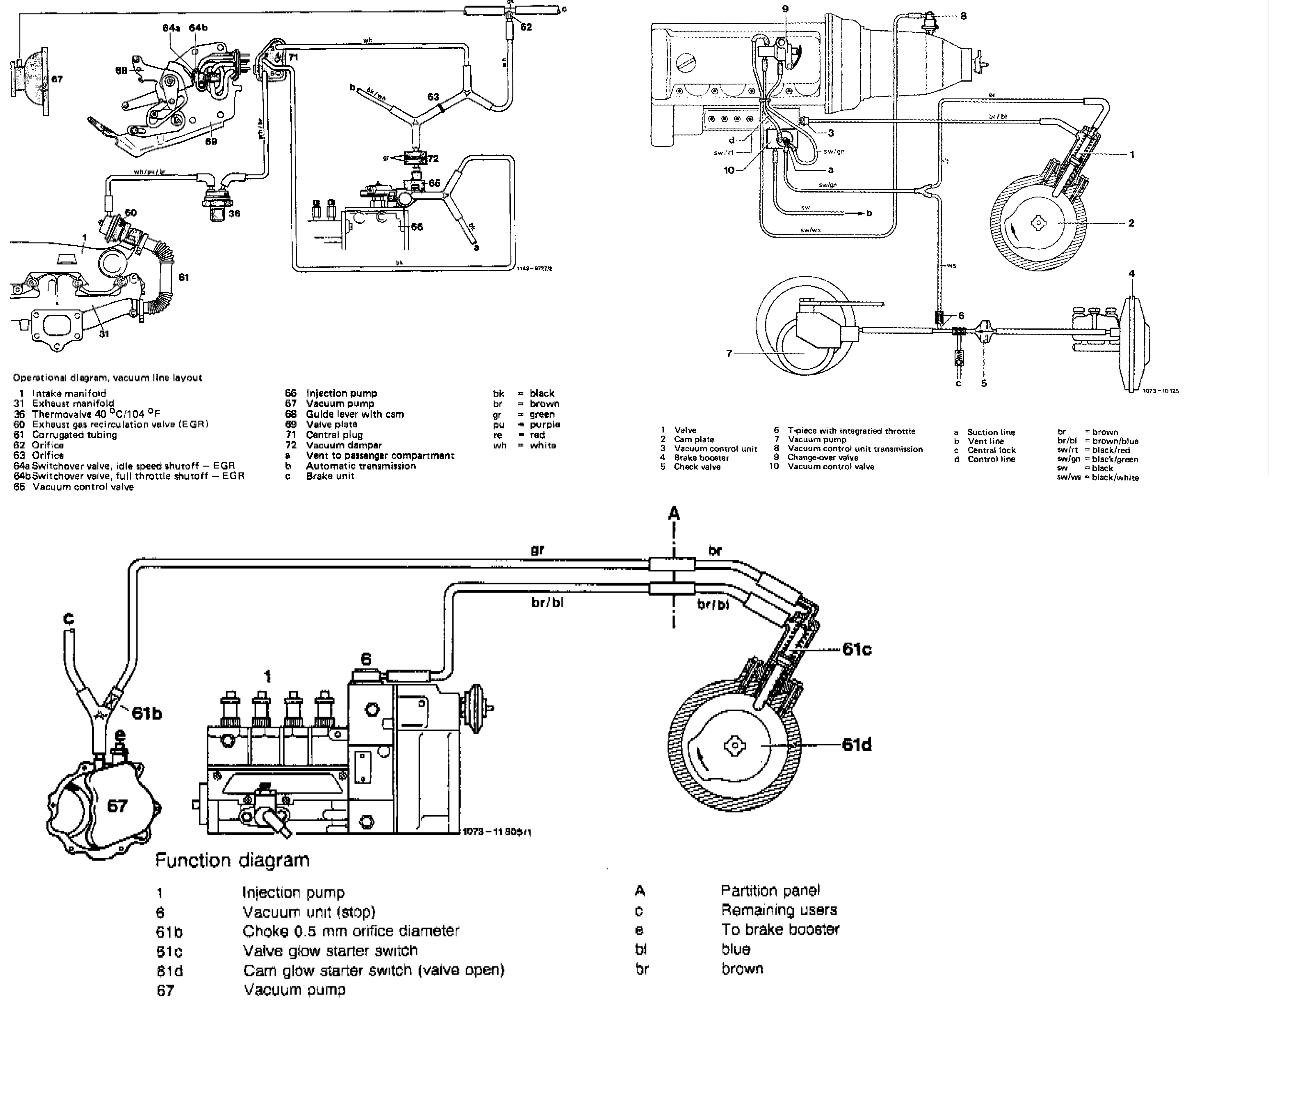 Mercedes Benz W123 Vacuum Diagram Trusted Wiring Diagrams 300d 1980 240d Diy Enthusiasts U2022 Control System